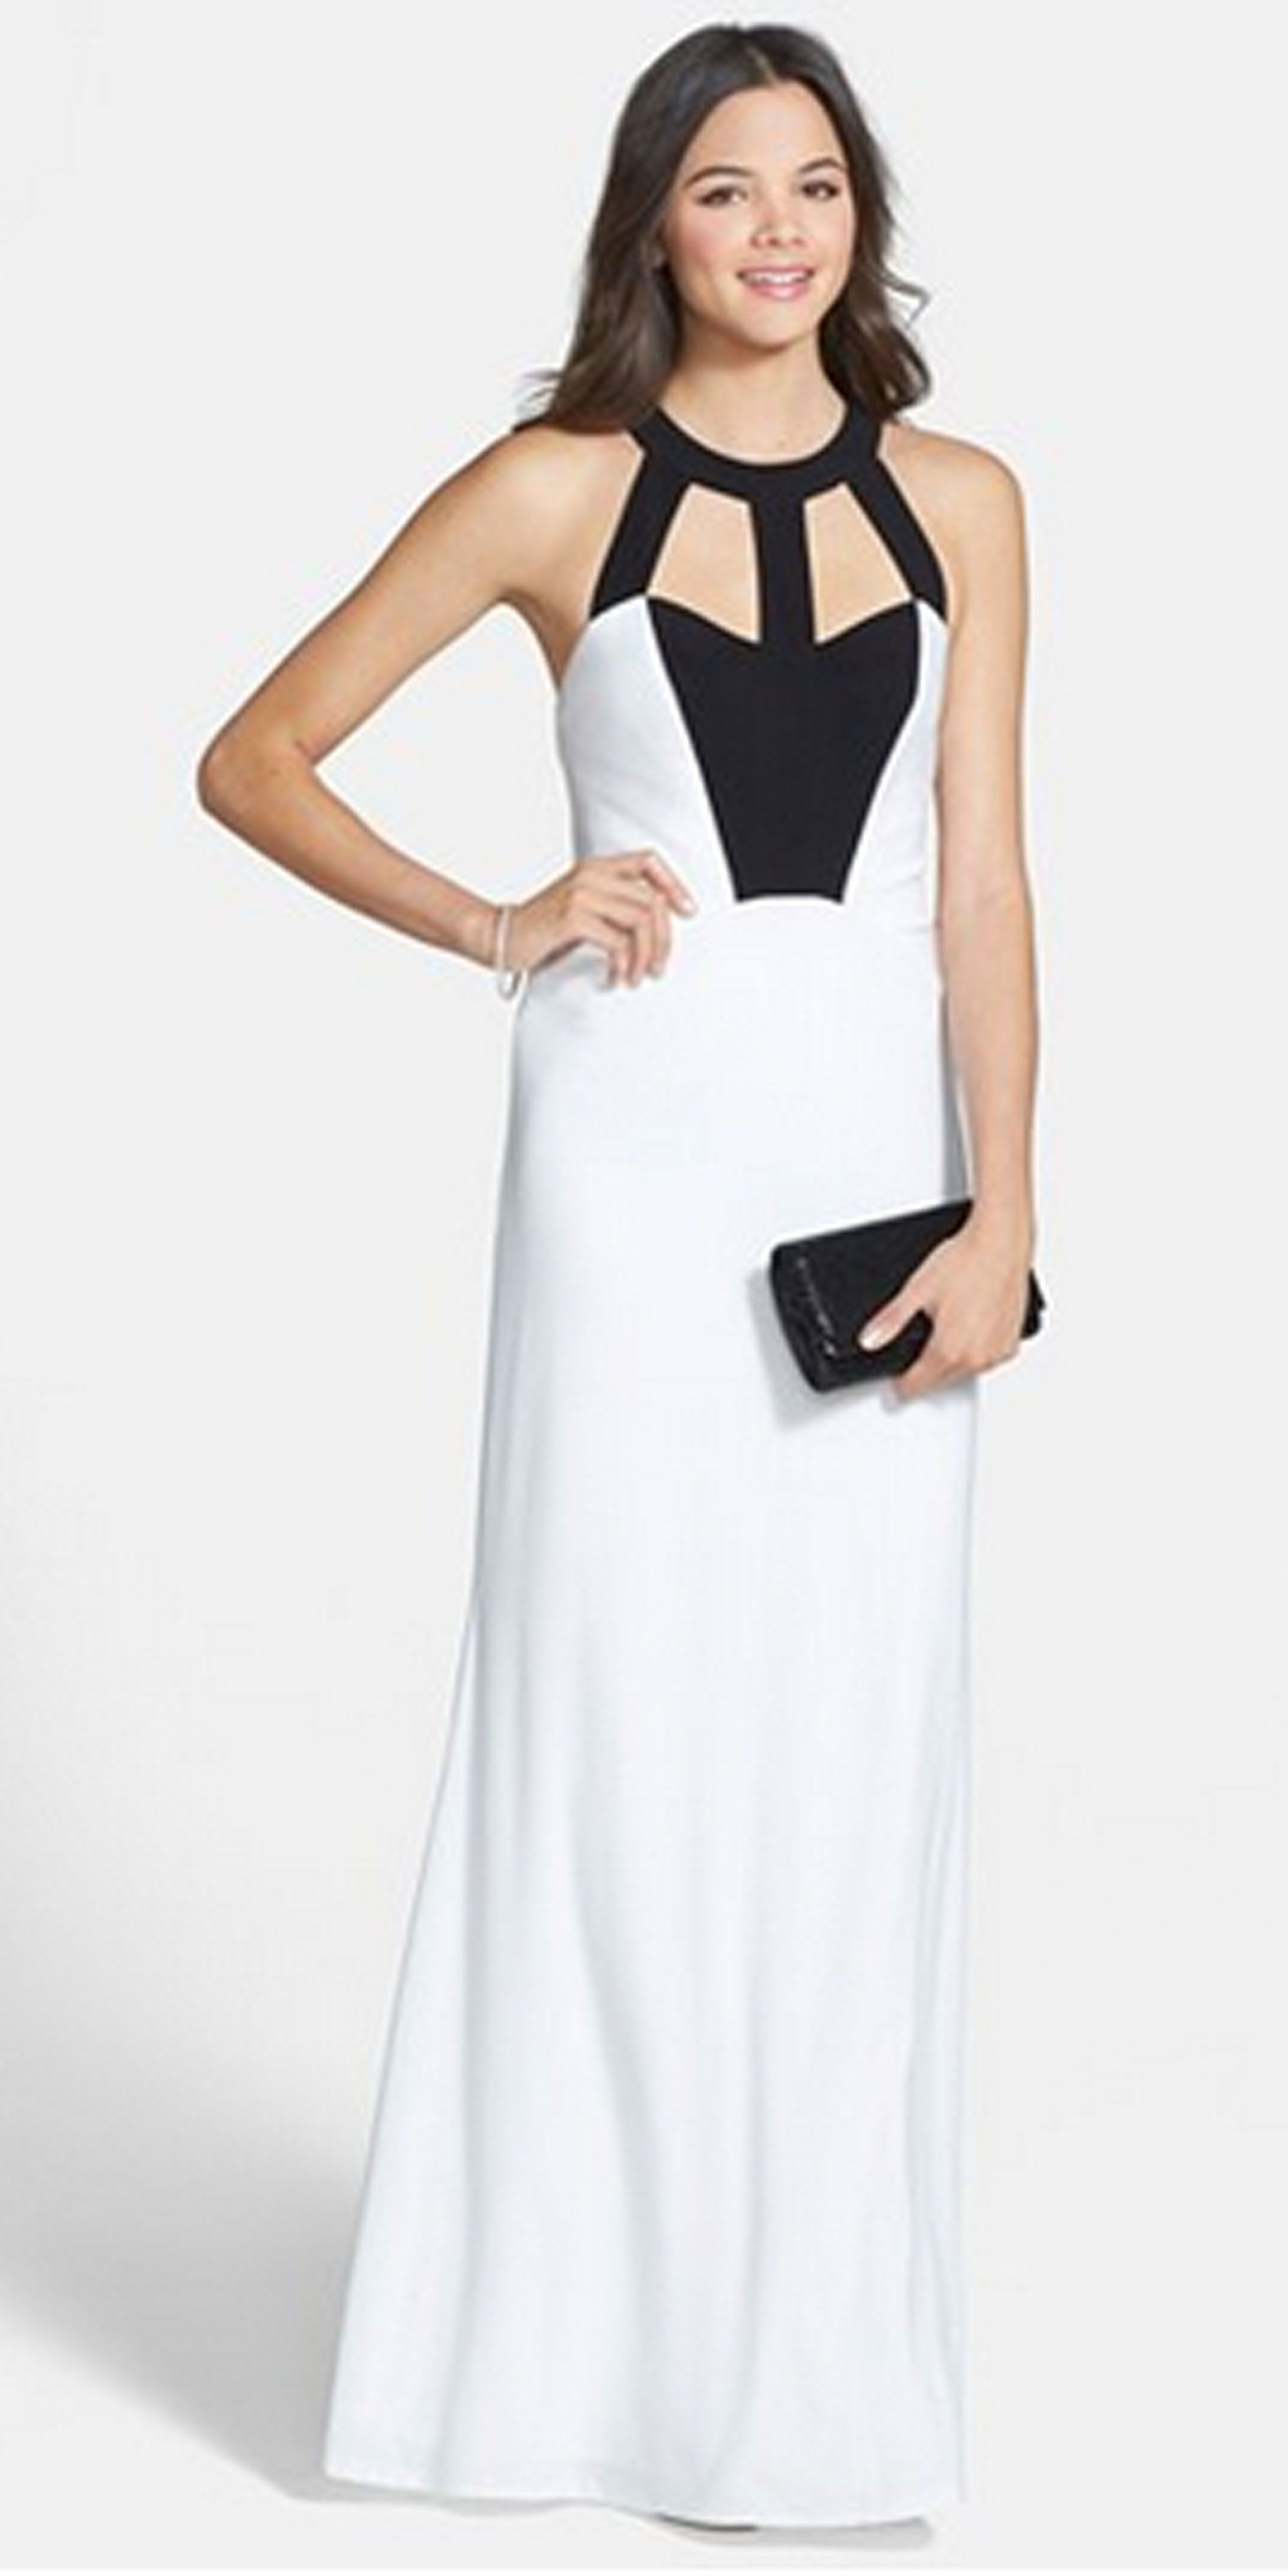 12 Gorgeous Prom Dresses Under $100 | fancy